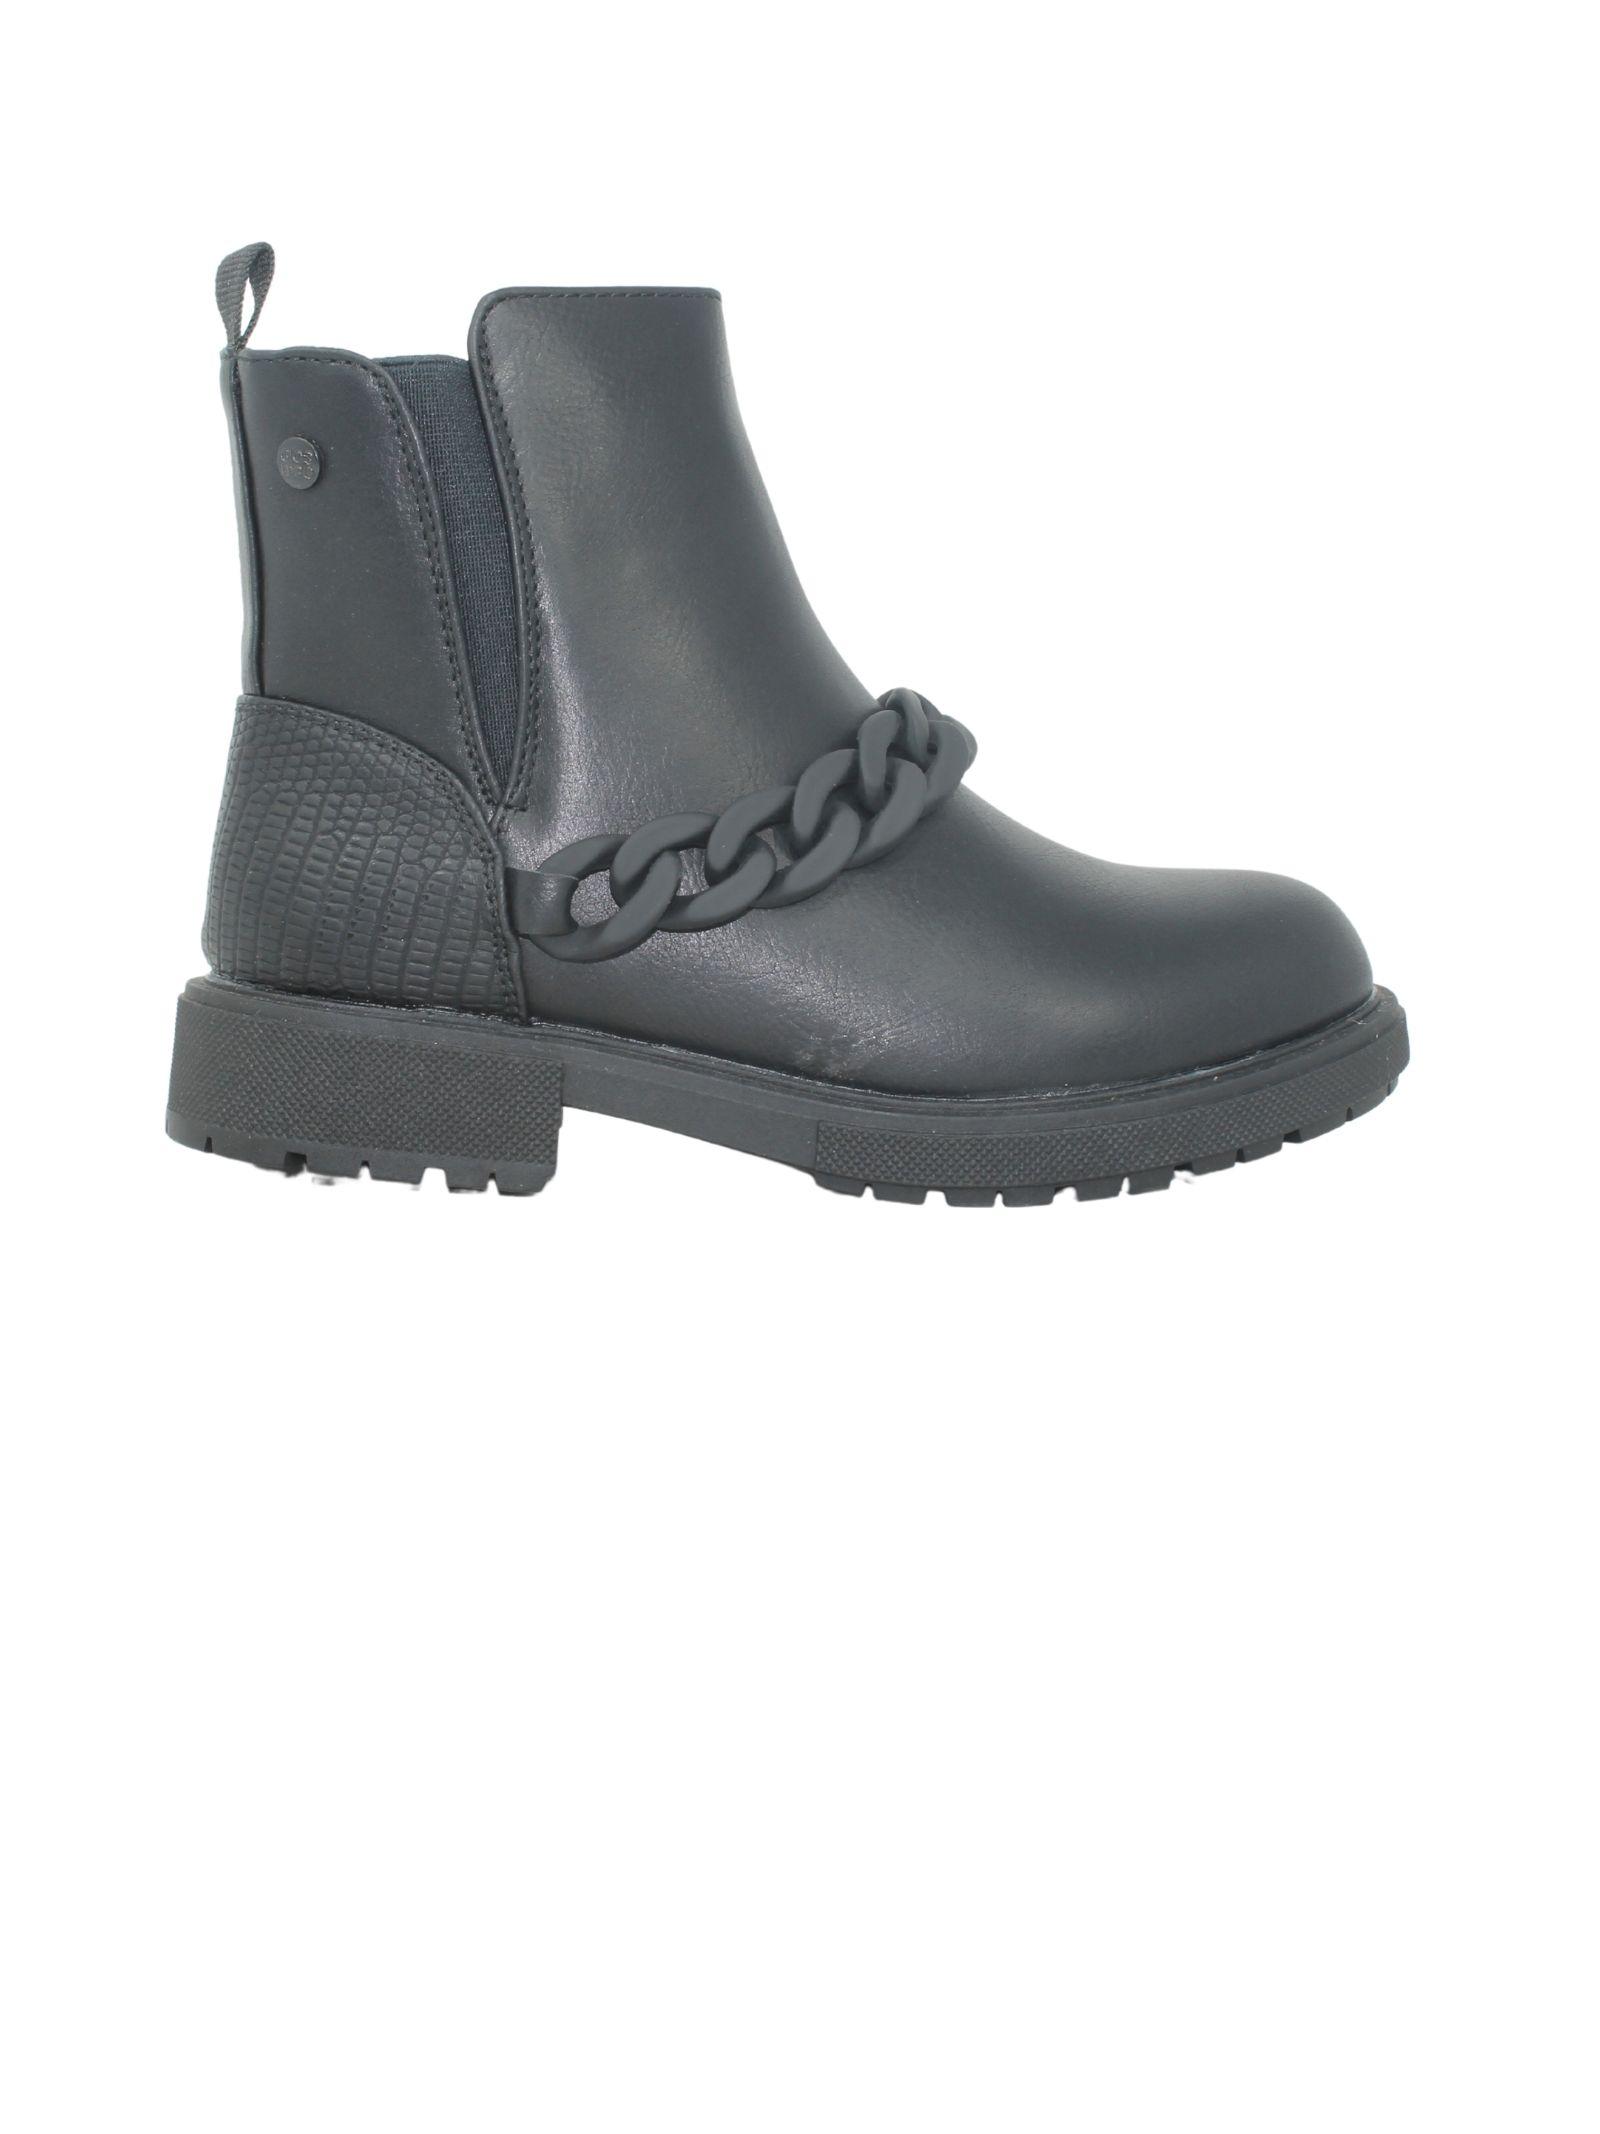 Maralal Girls boots GIOSEPPO KIDS |  | 64003NERO